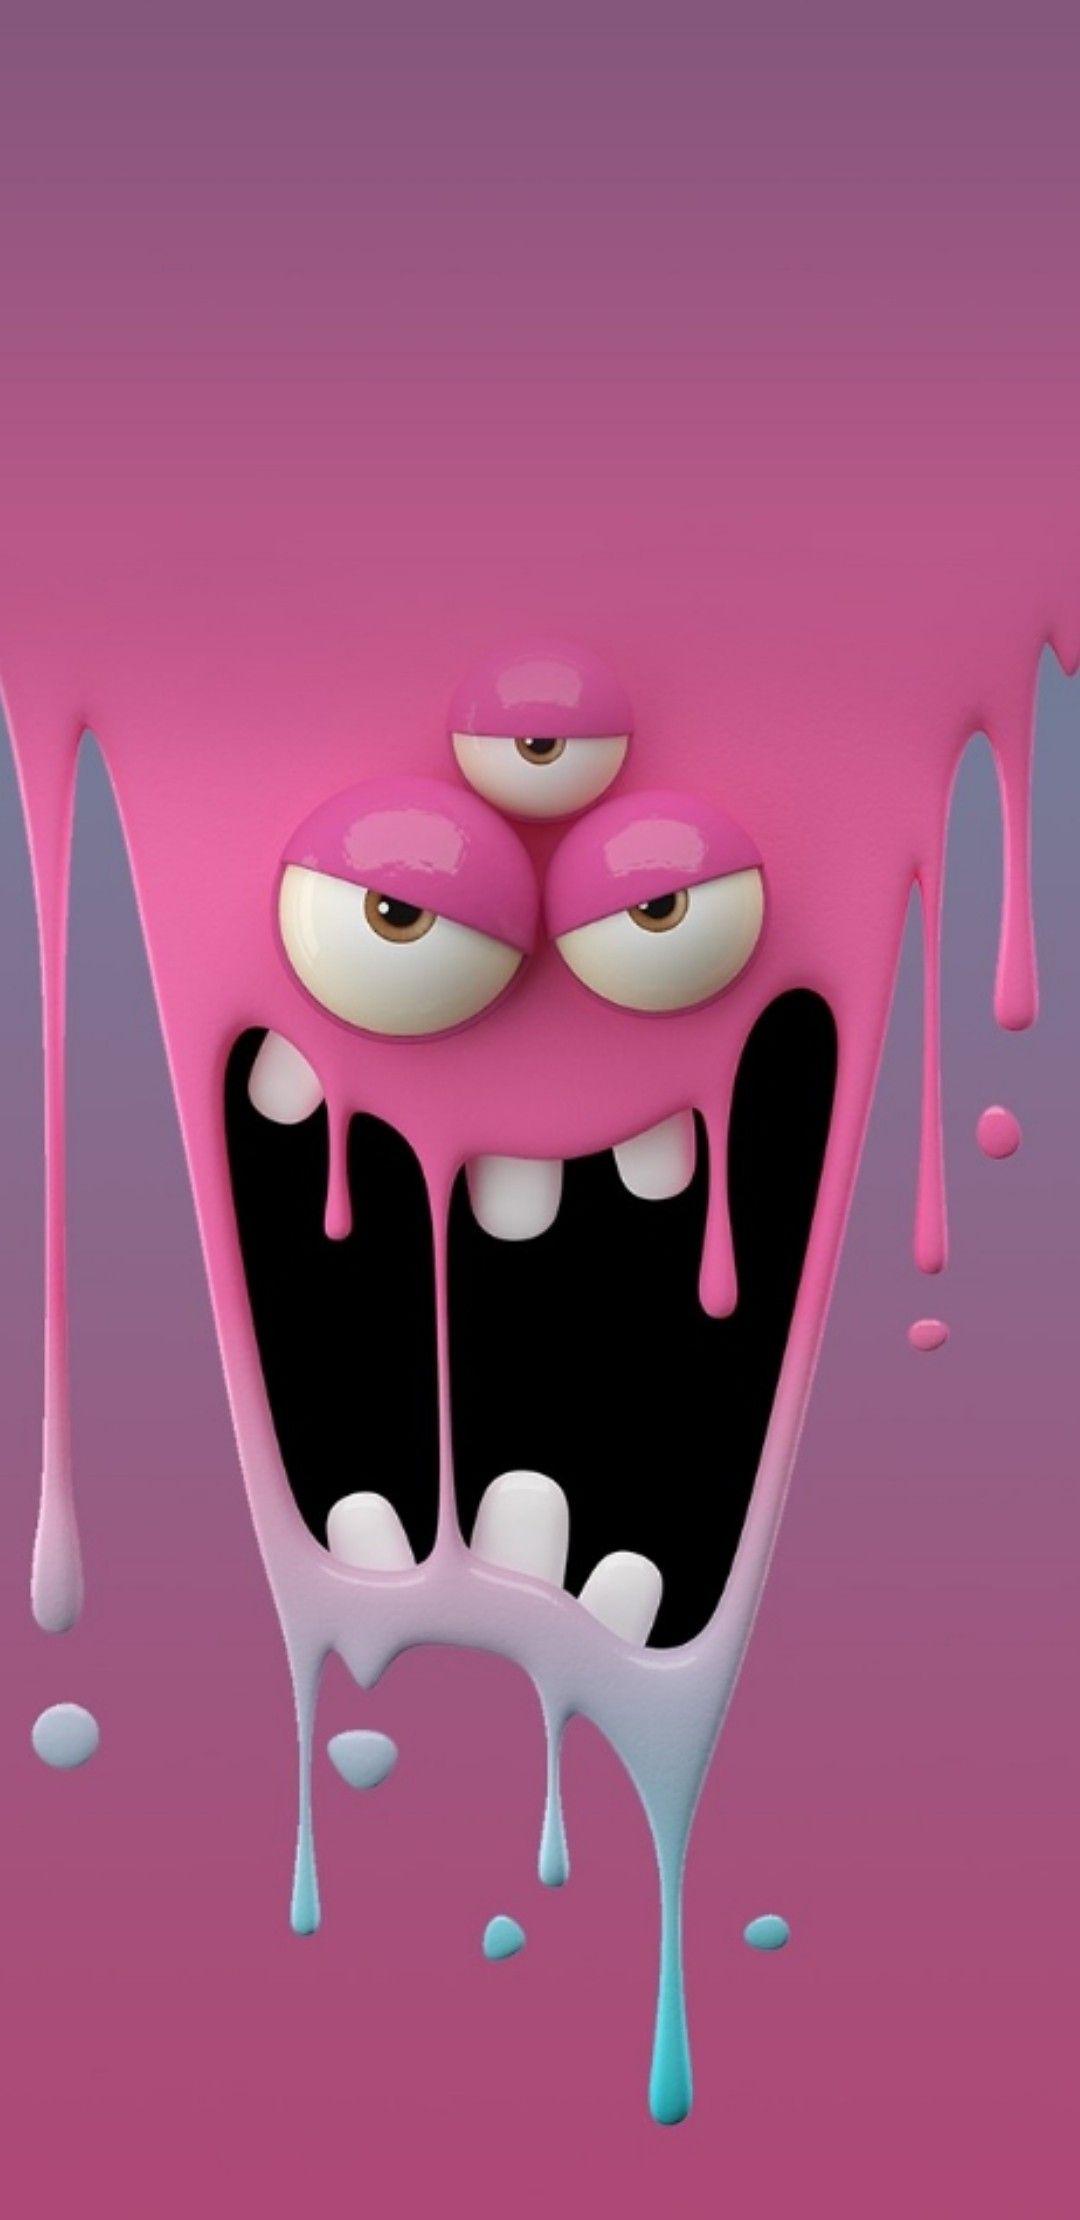 Monster Funny Iphone Wallpaper Cartoon Wallpaper Hd Emoji Wallpaper